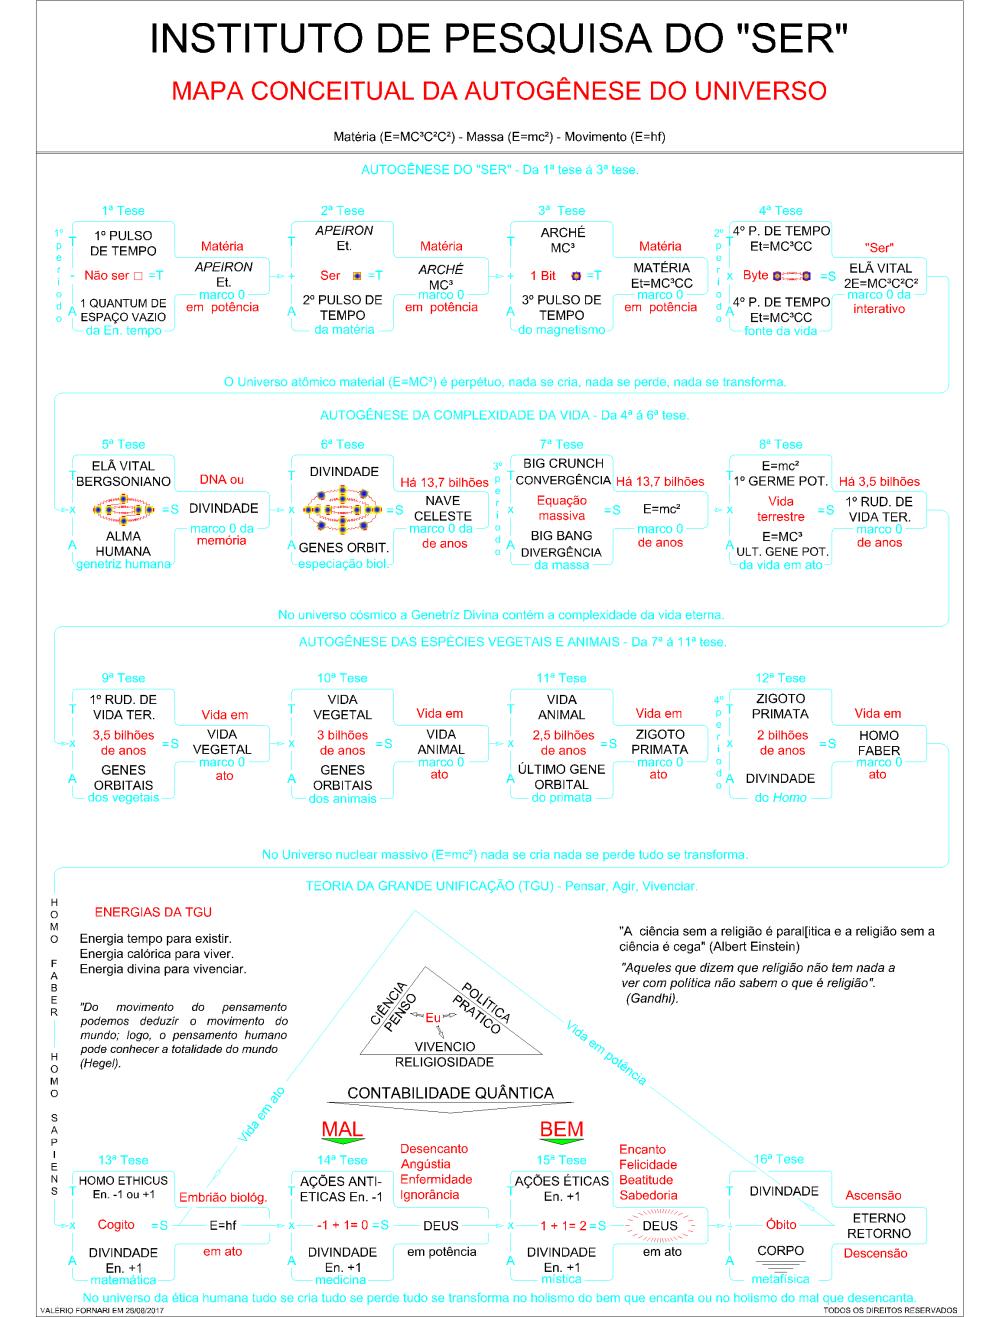 MAPA CONCEITUAL AUTOG. UNIVERSO-Model